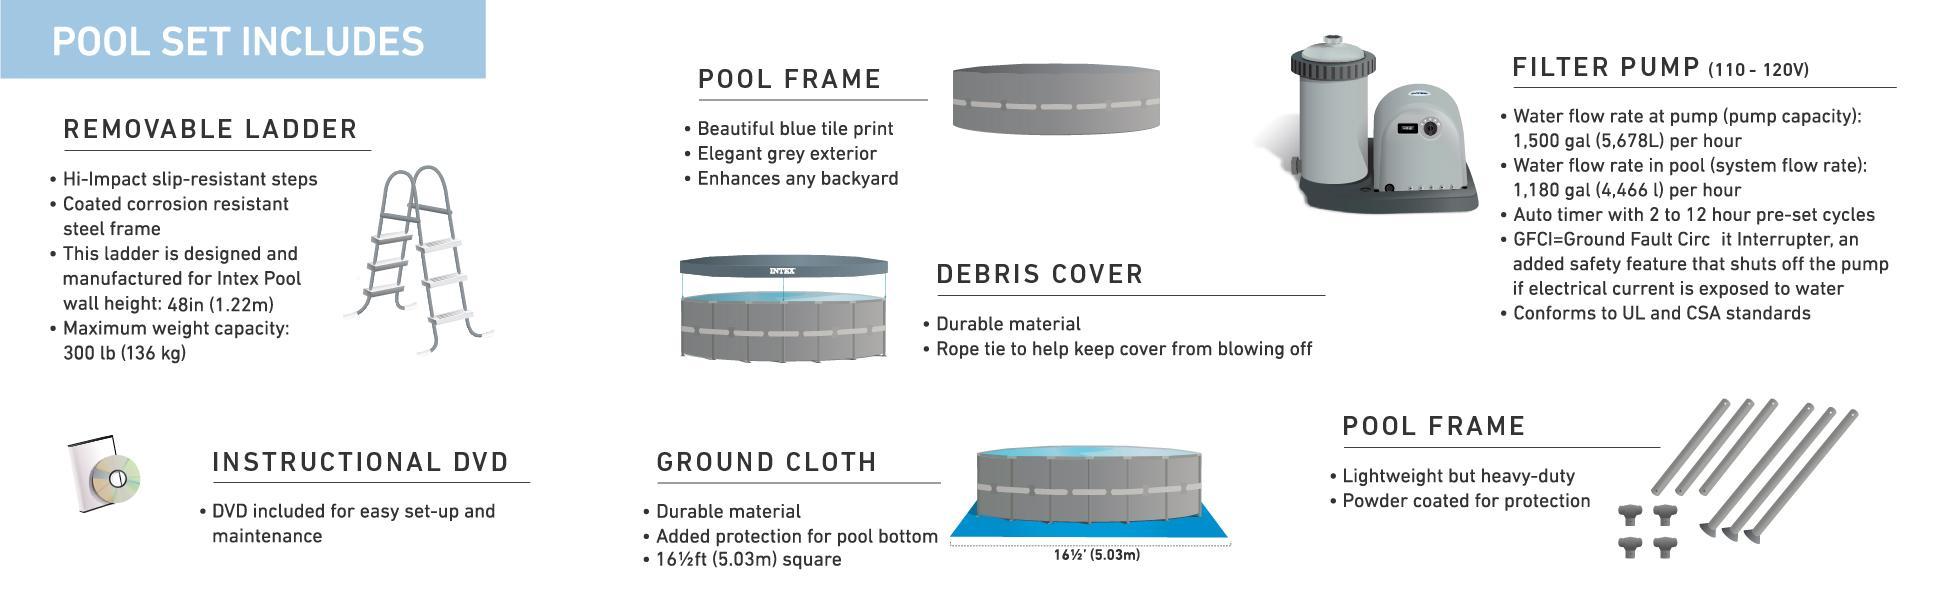 Pool info 1